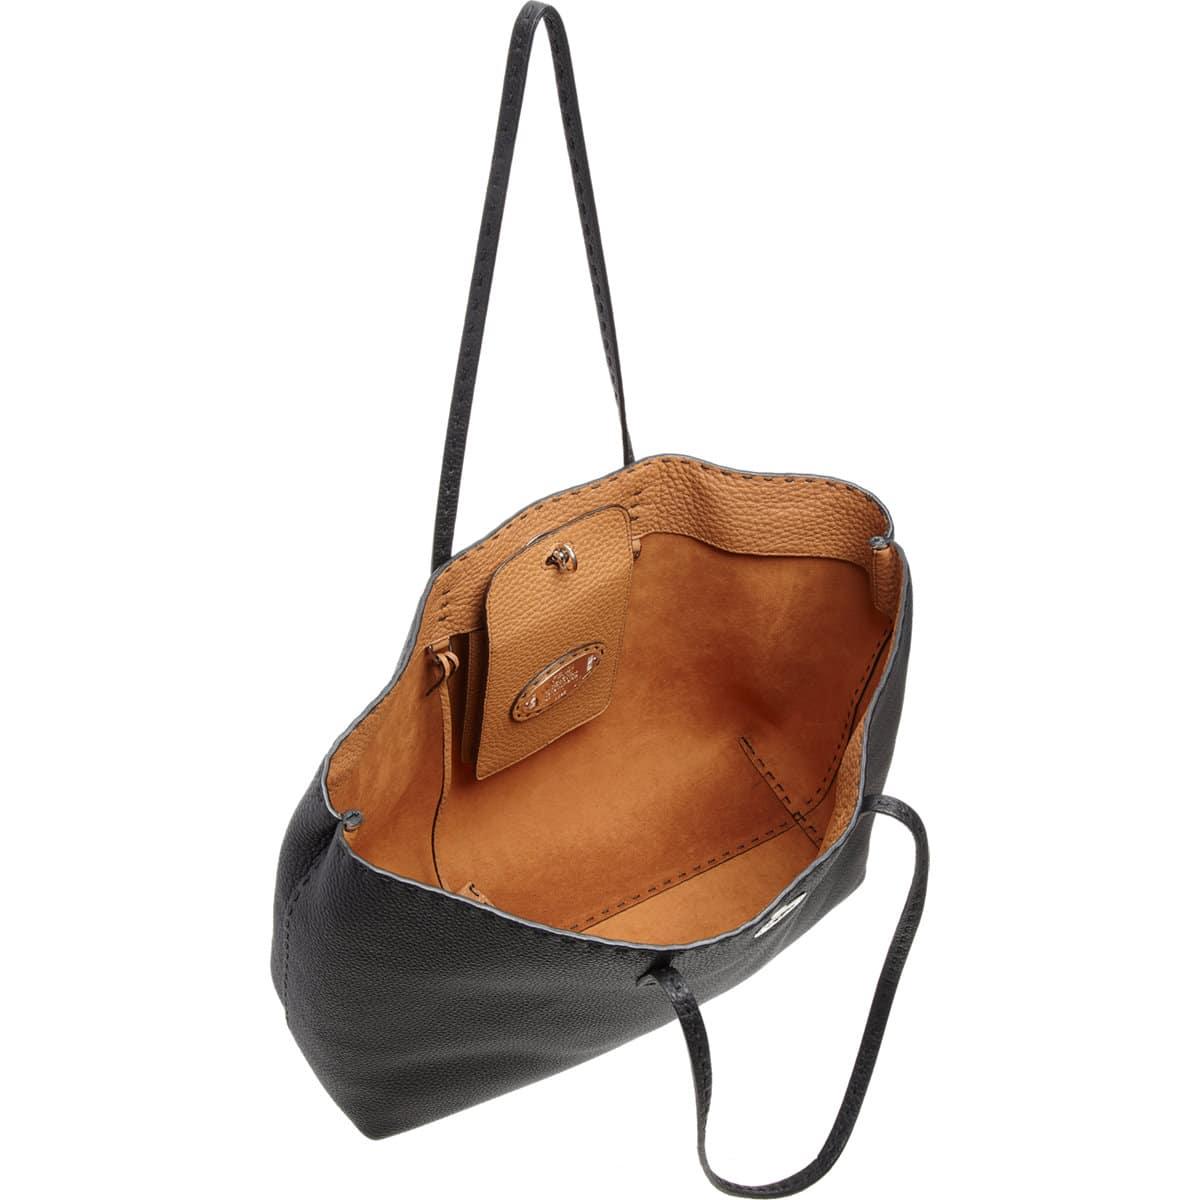 Fendi Carla Selleria Tote Bag Reference Guide Spotted